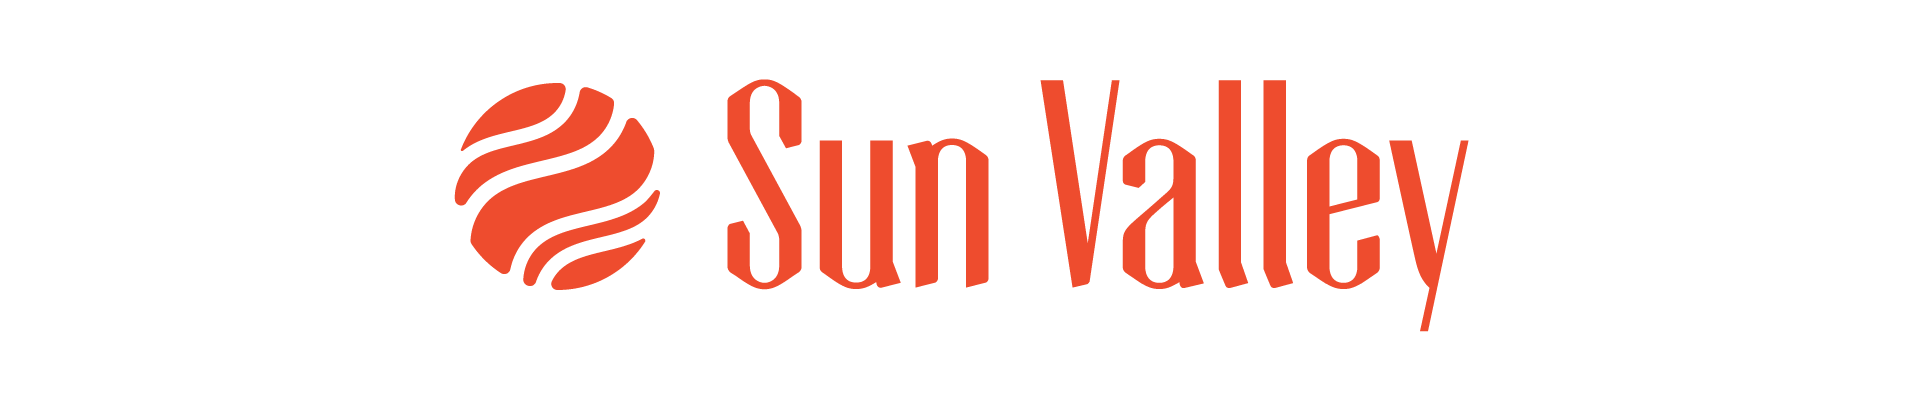 nicole-mata_sun-valley-logo-03.png